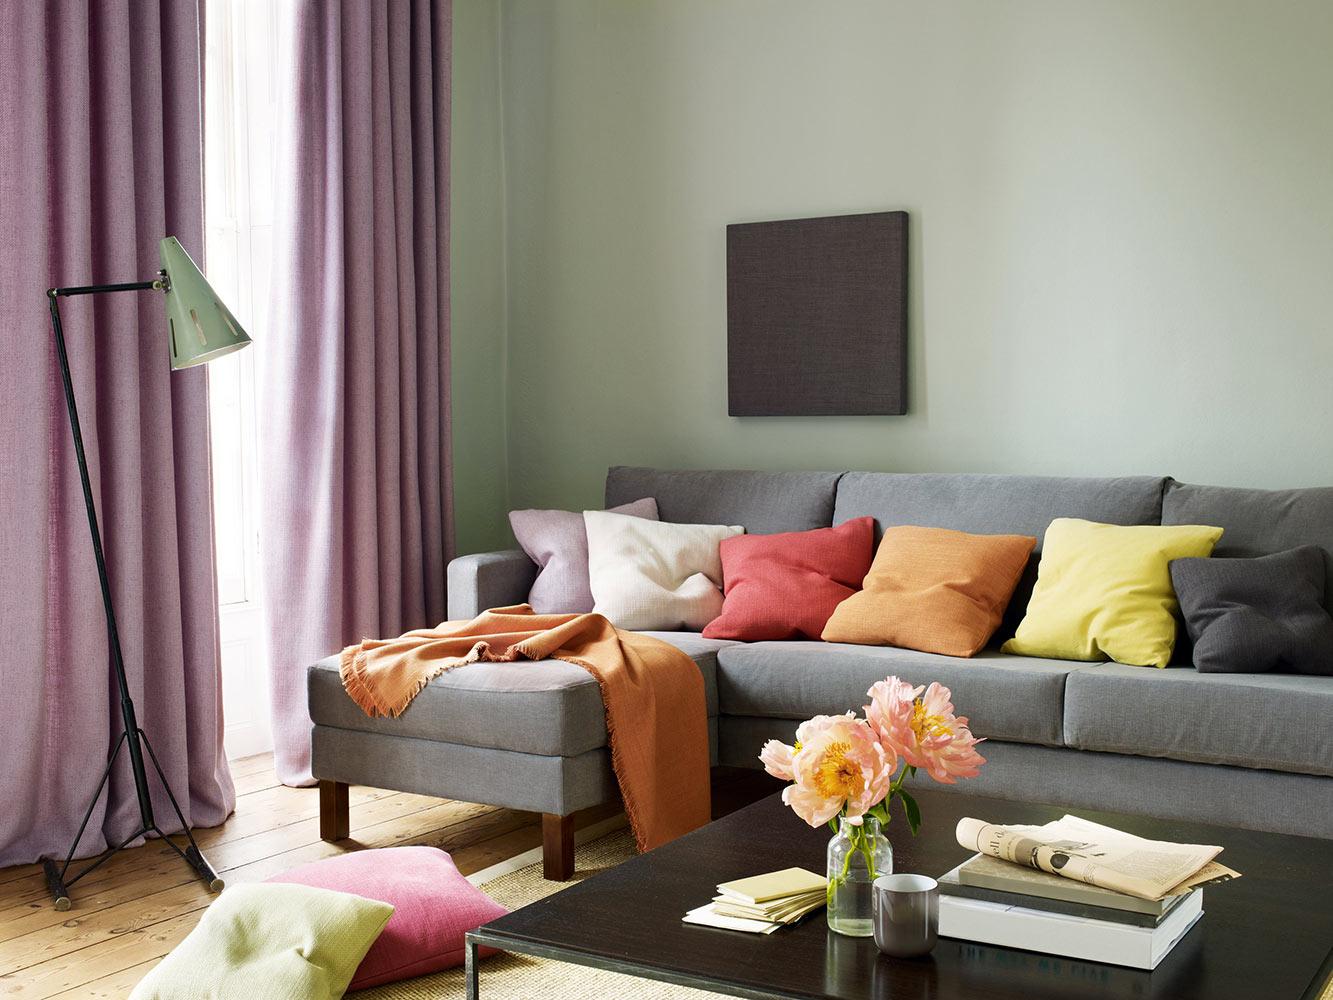 Life Style Modern  room .jpg